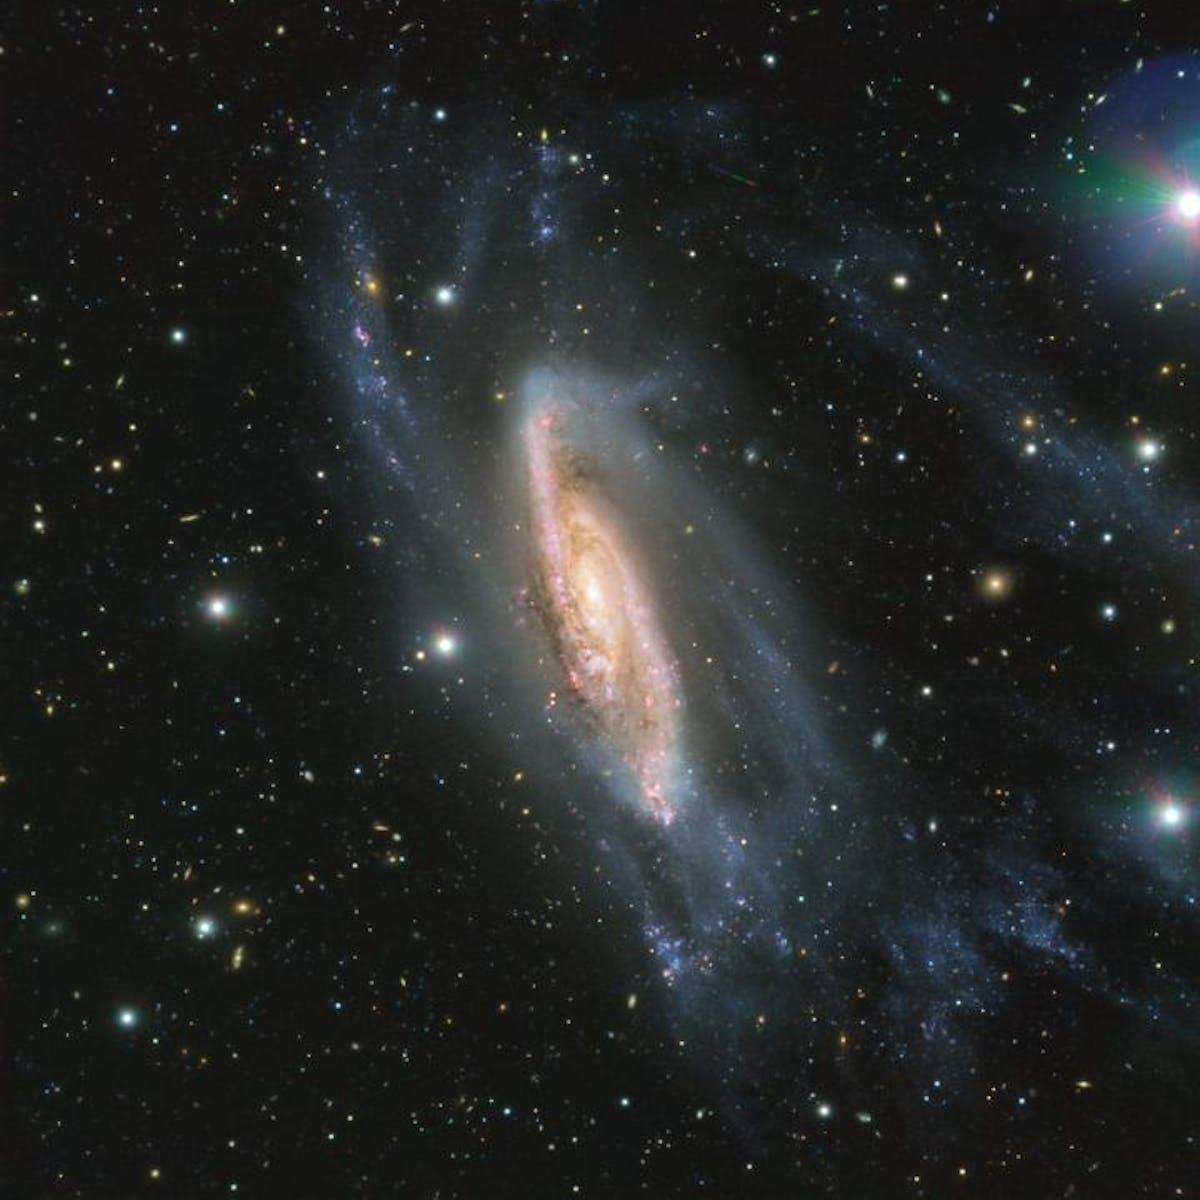 Resplendent Spiral Galaxy Found Within the Crater Constellation